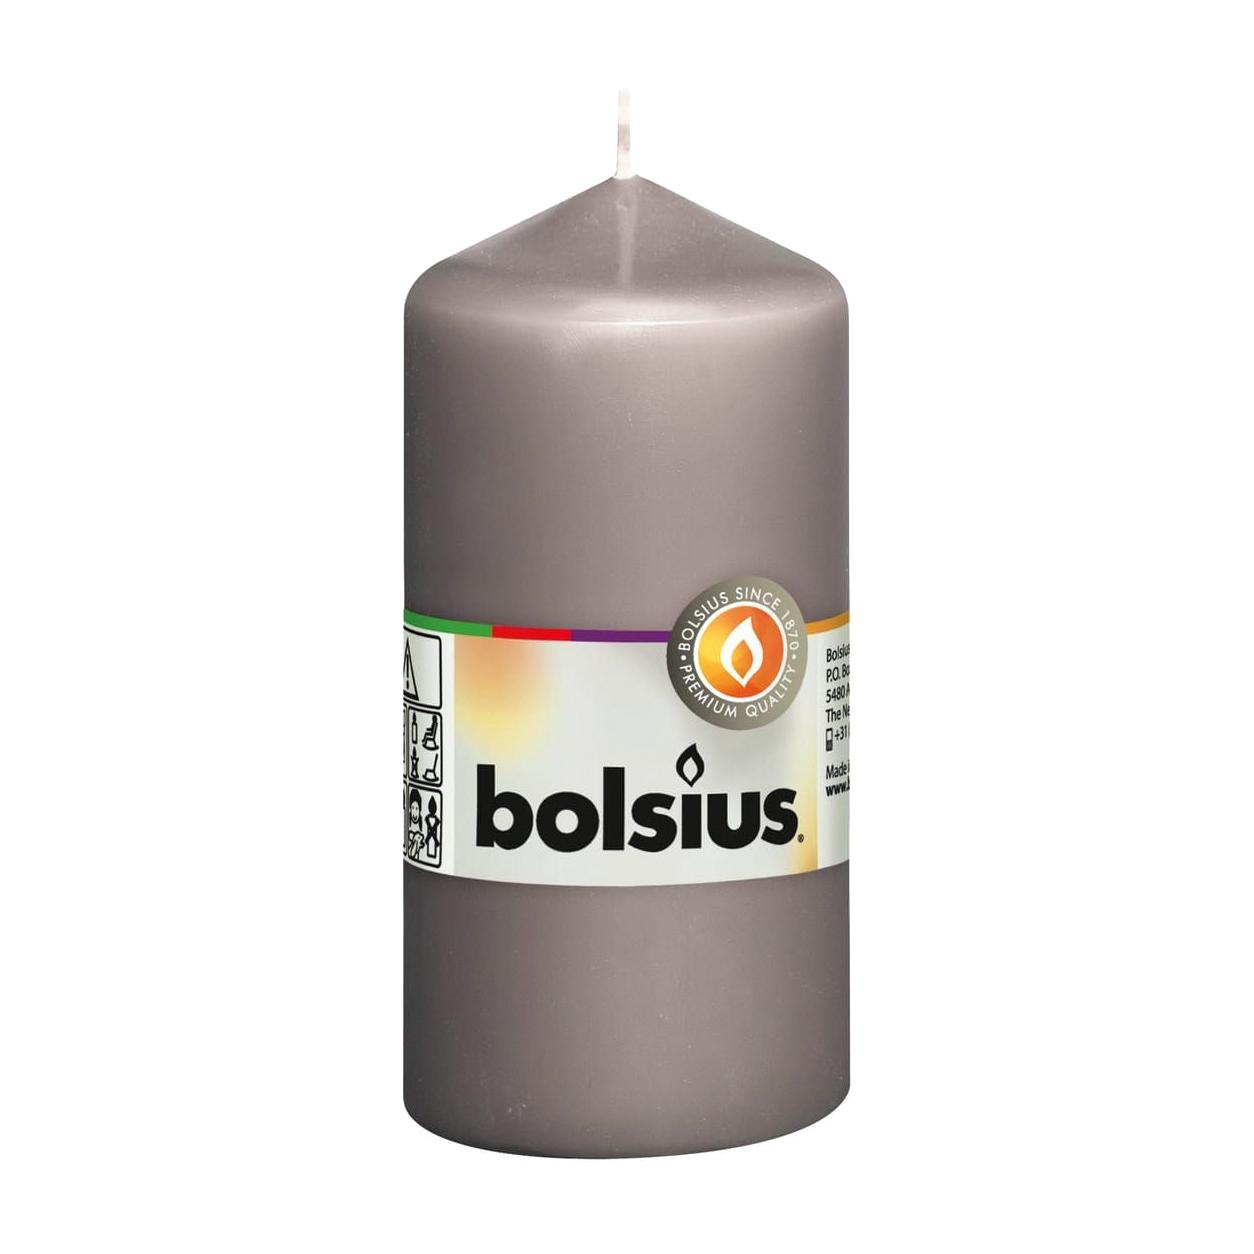 Фото - Свеча-столбик Bolsius 12x6 серая свеча столбик bolsius 12x6 коричневая